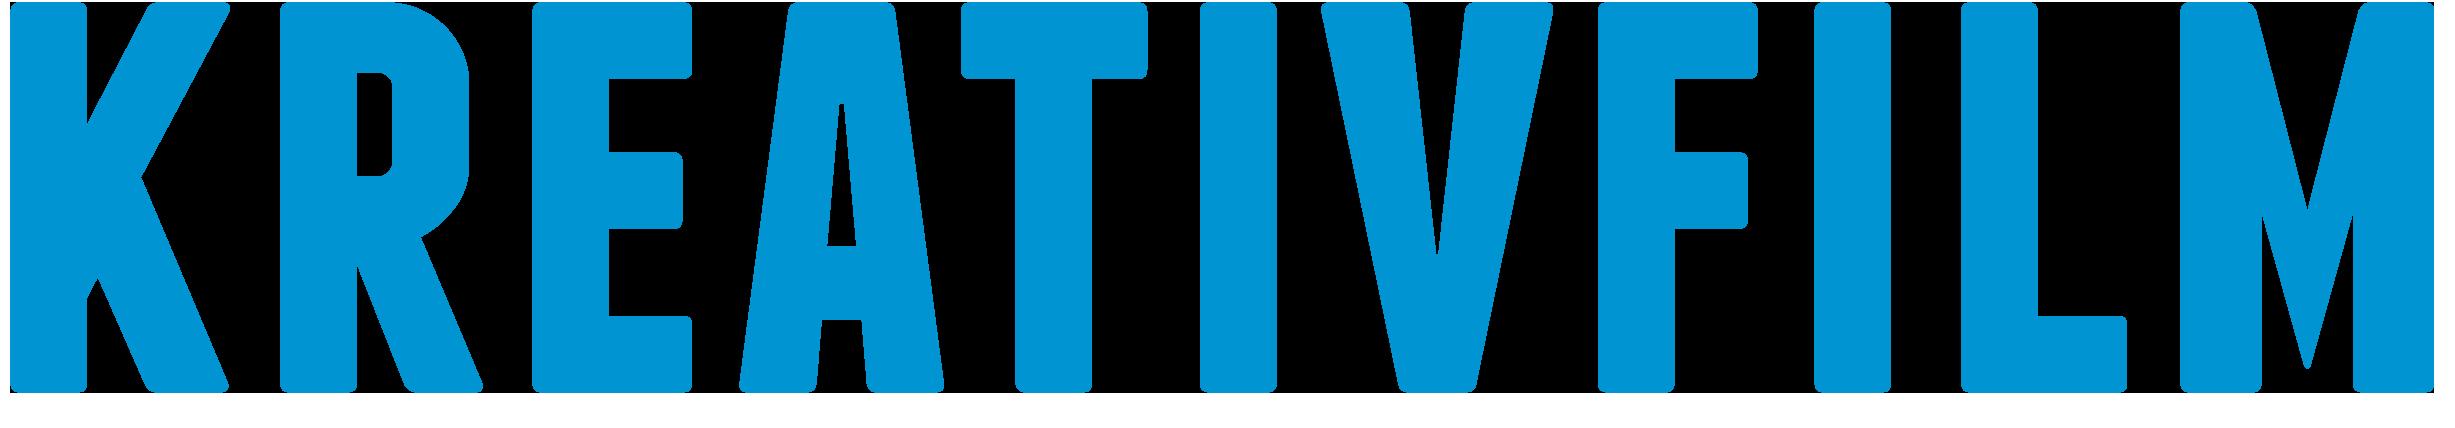 kreativfilm_logo19